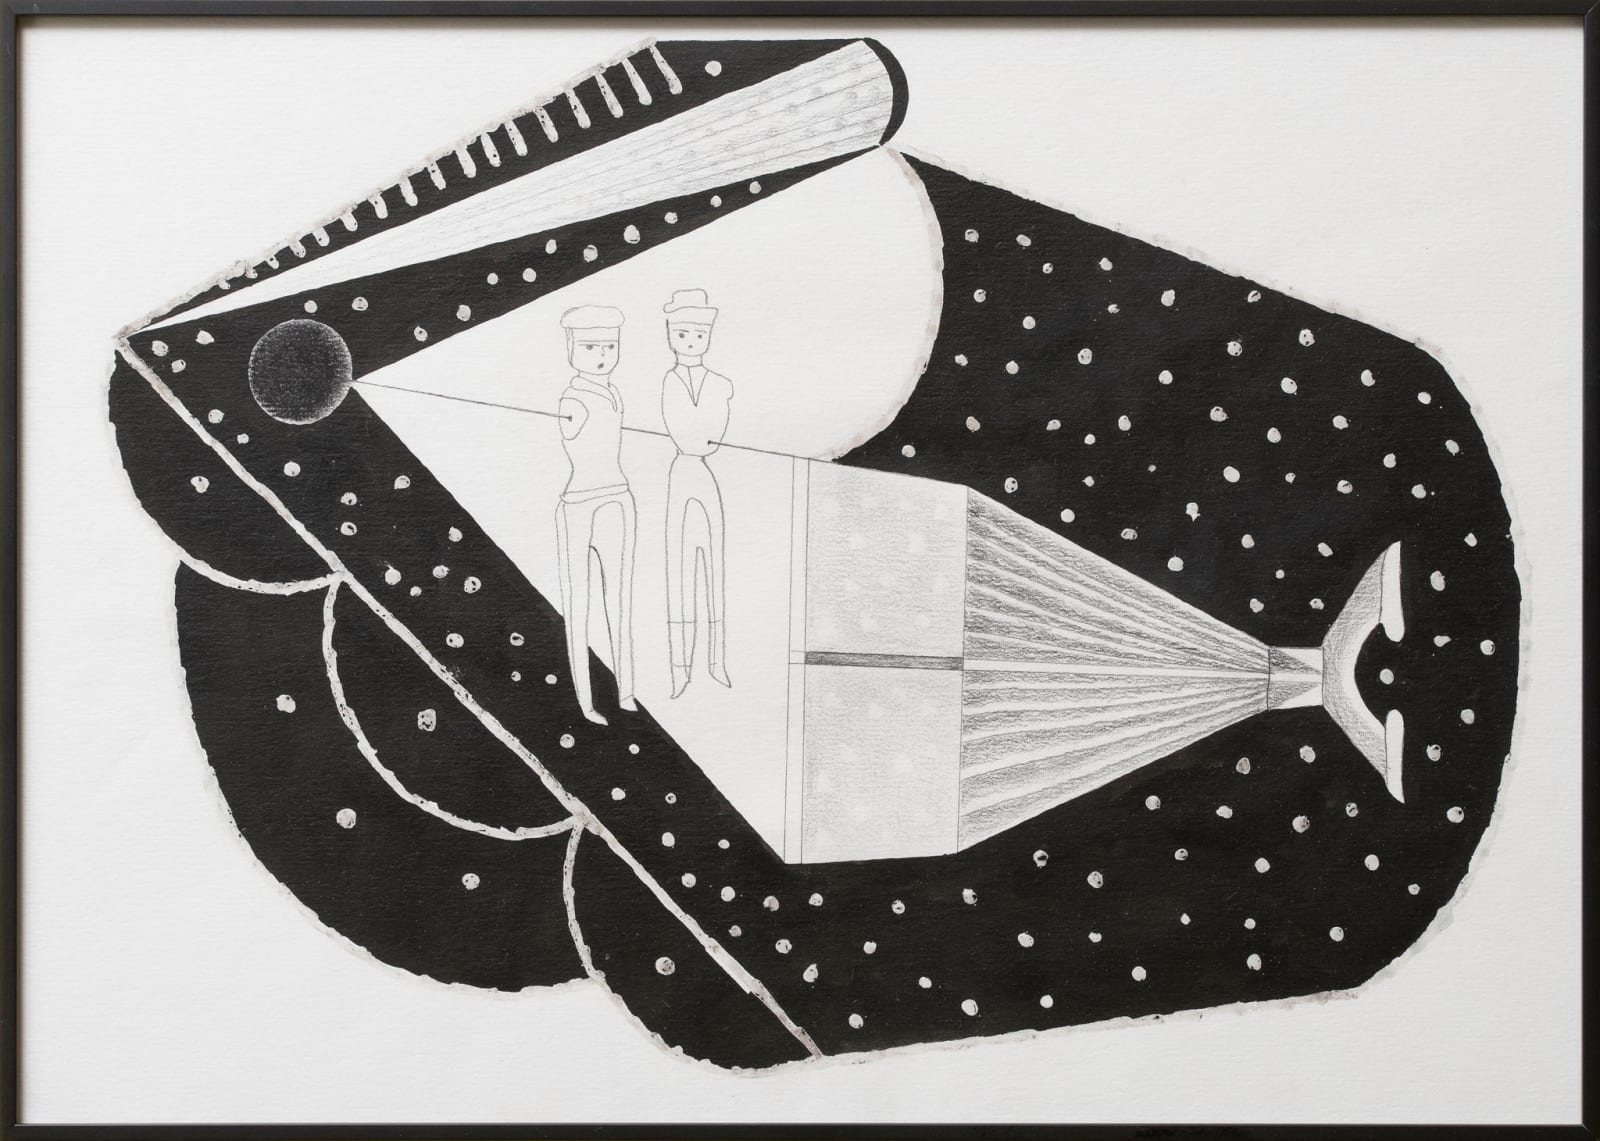 Anna Hulacova, Untitled, 2015, paper, graphite, ink, wax 30,5 x 42,5 x 2 cm